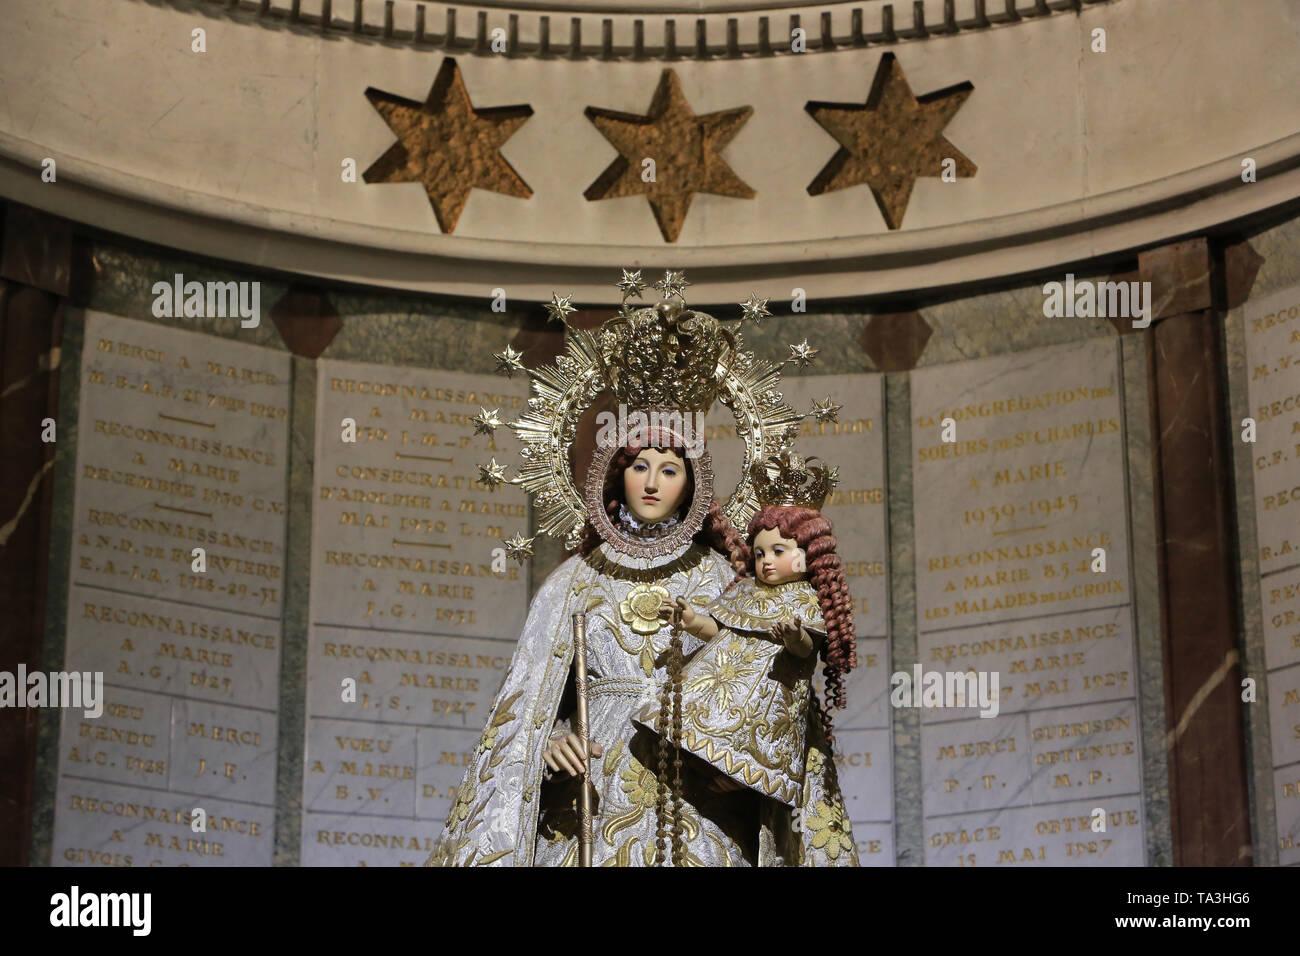 La Vierge de La Naval de Manille. Crypte. Basilika Notre-Dame de Fourvière. Lyon. Die Jungfrau von La Naval de Manila. Krypta. Stockbild